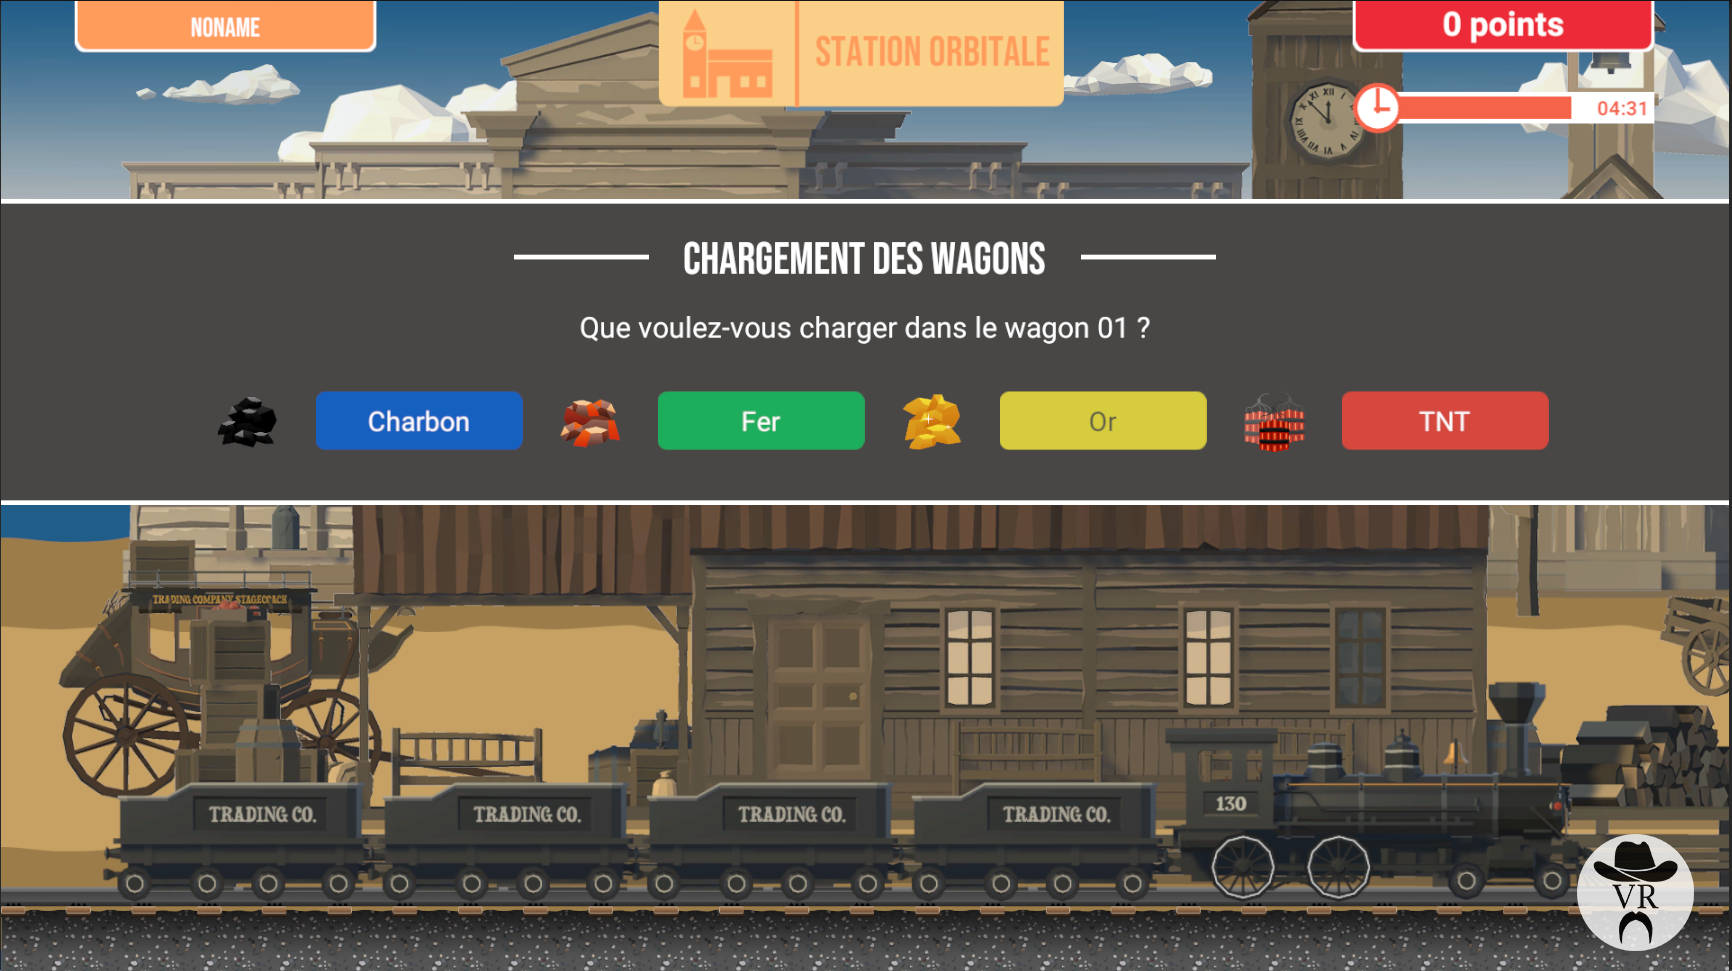 Game of Train Virtual Rangers